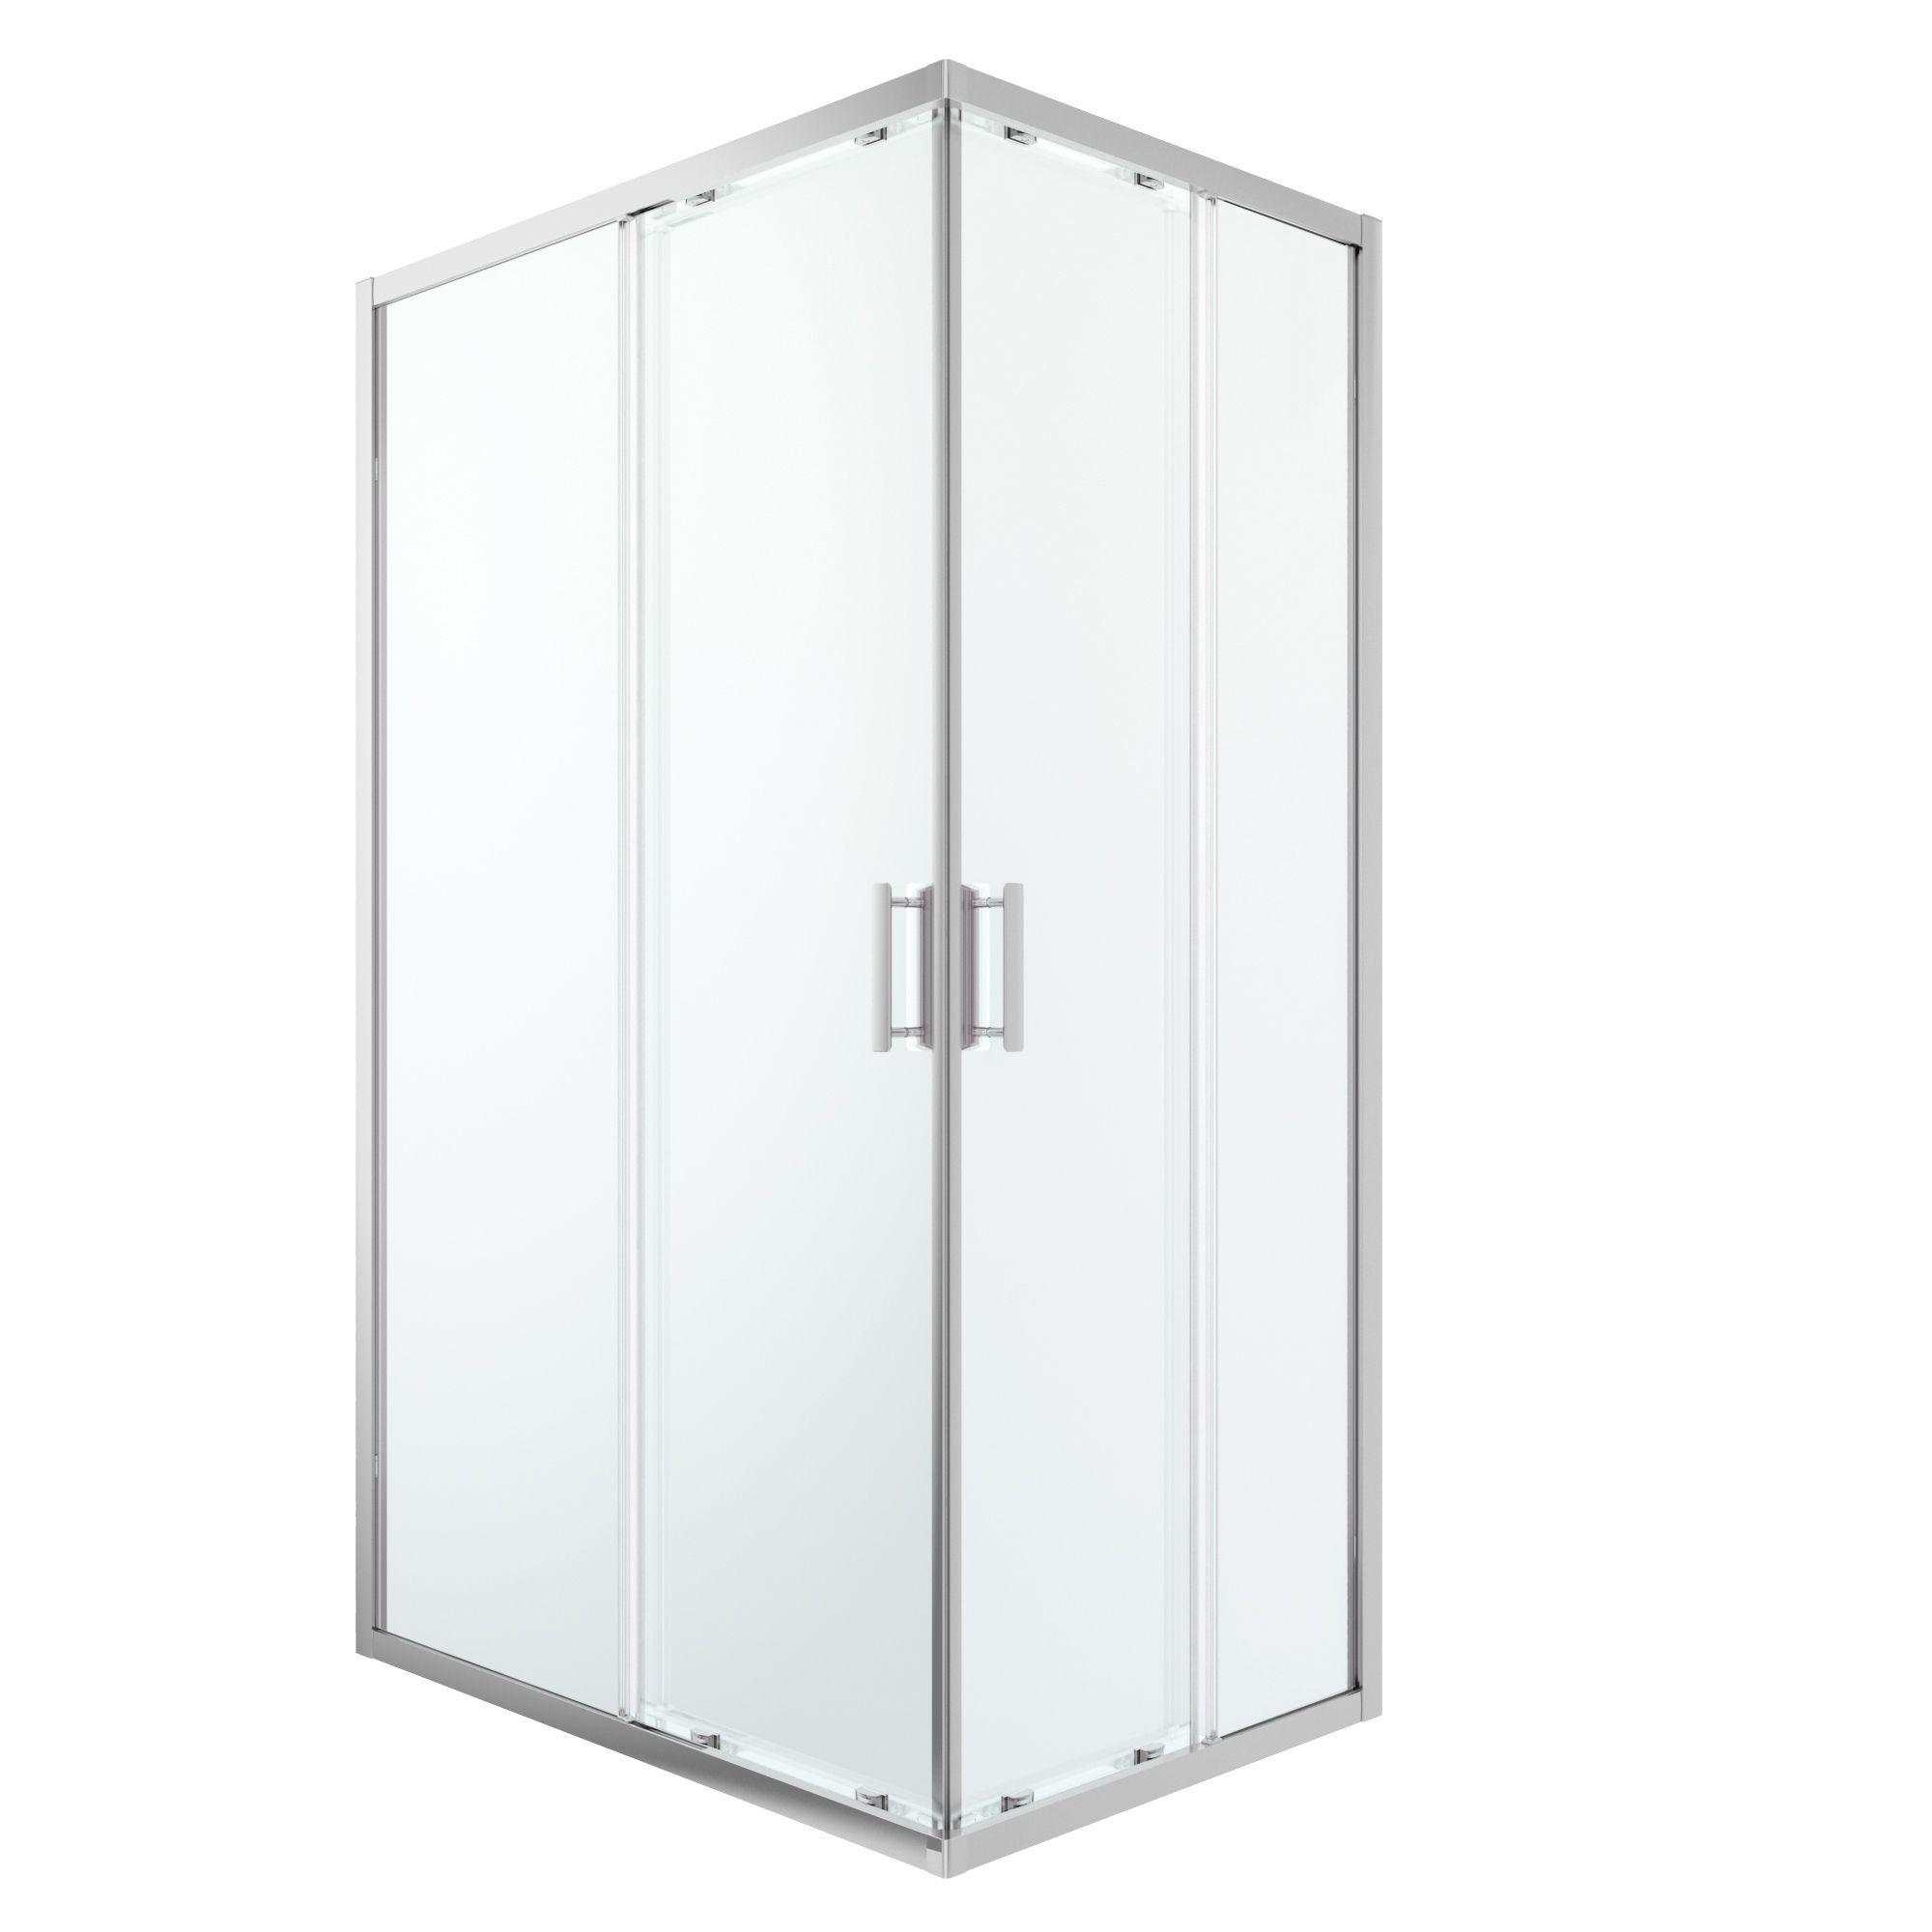 Cooke & Lewis Beloya Rectangular Shower Enclosure With Corner Entry Double Sliding Door (w)1200mm (d)800mm